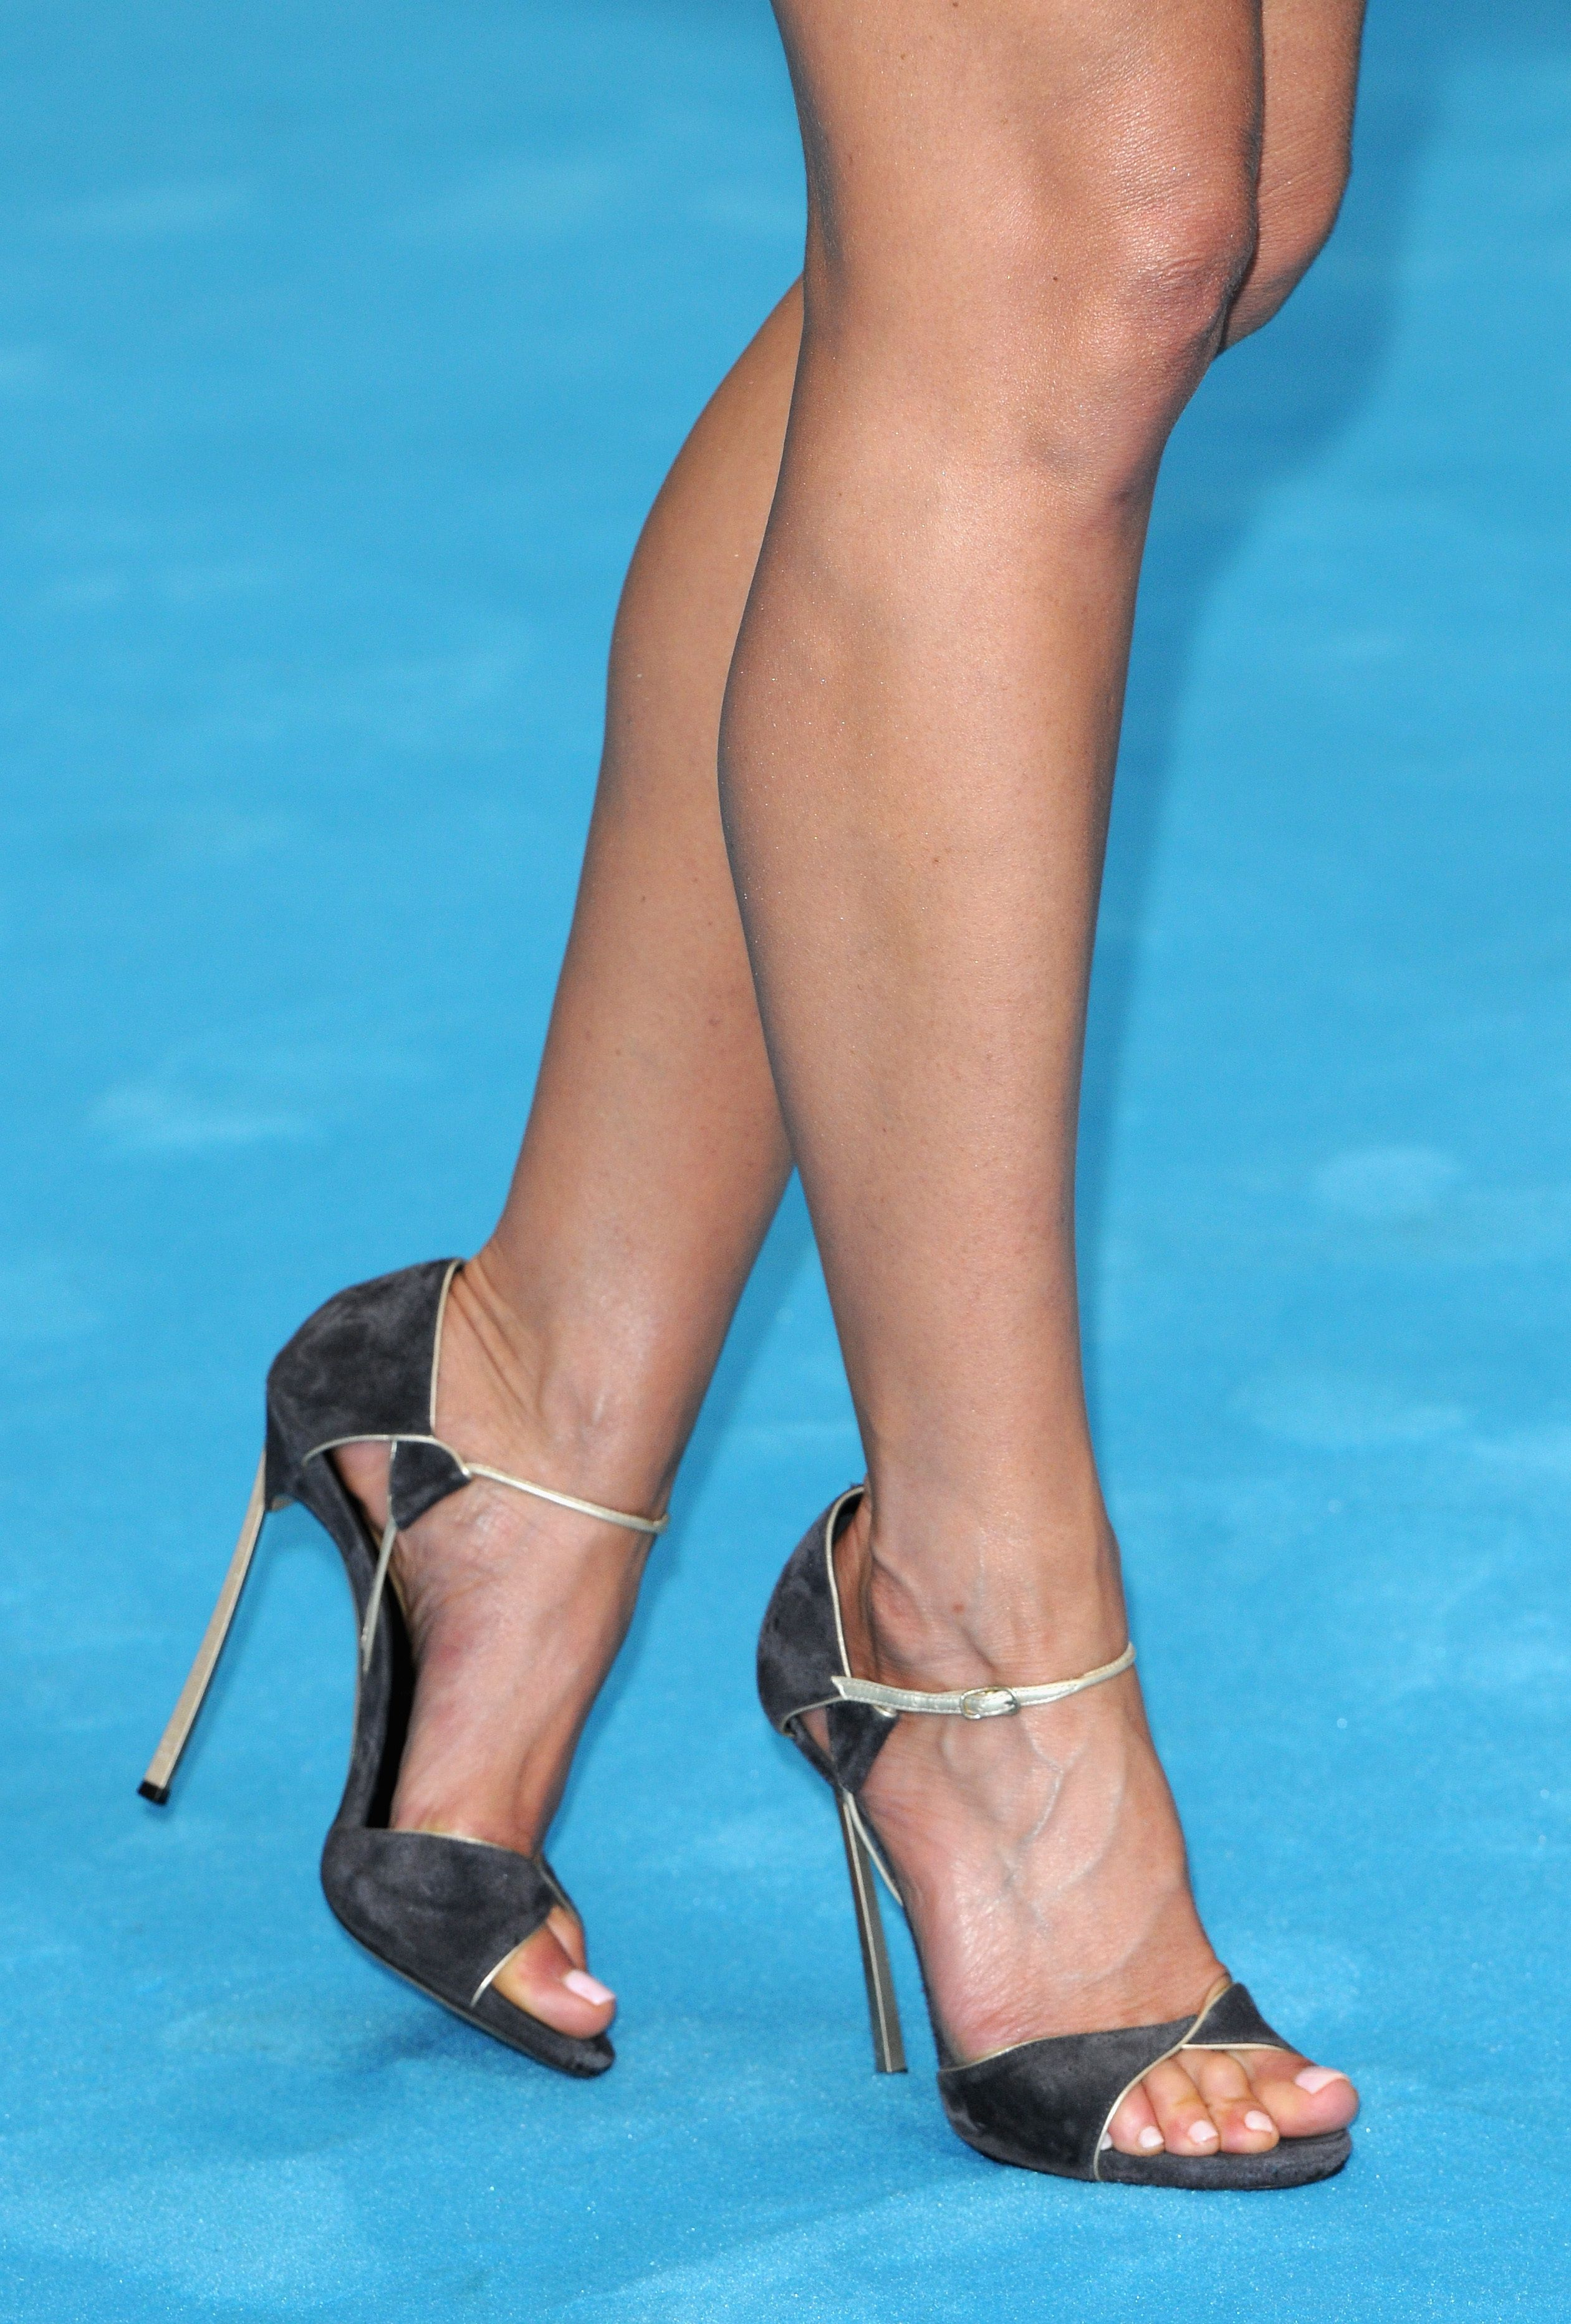 Pin By Marcin On Jennifer Aniston 7 0 Red Carpet Shoes Heels Jennifer Aniston Feet